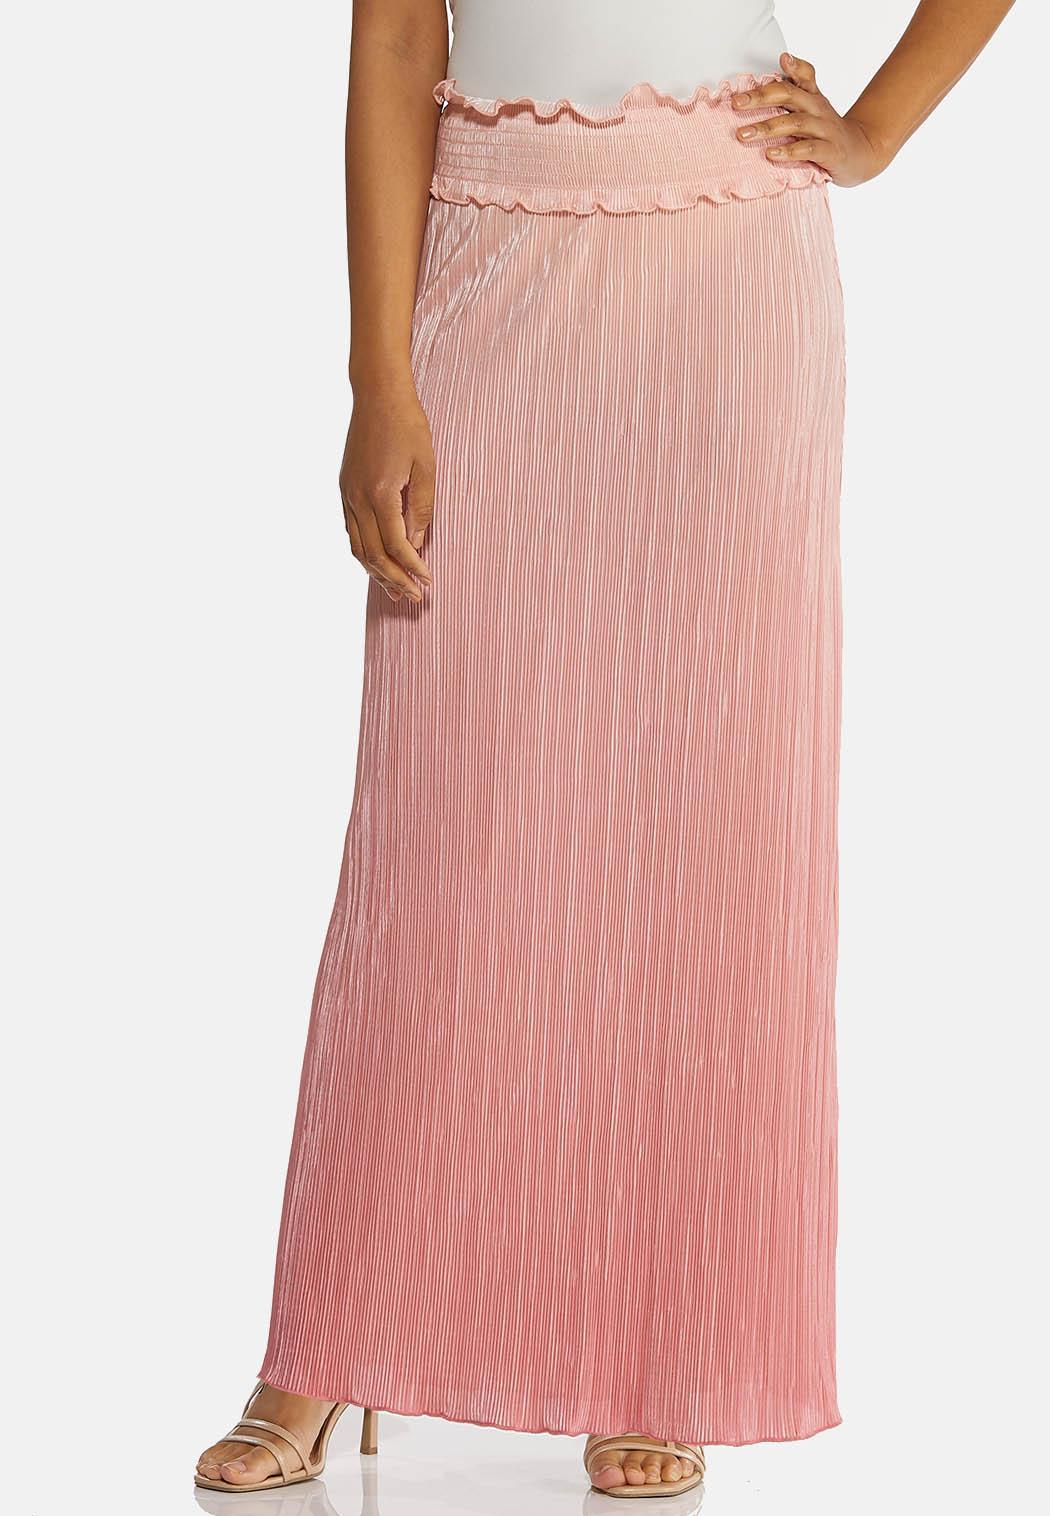 Plus Size Blush Pleated Maxi Skirt